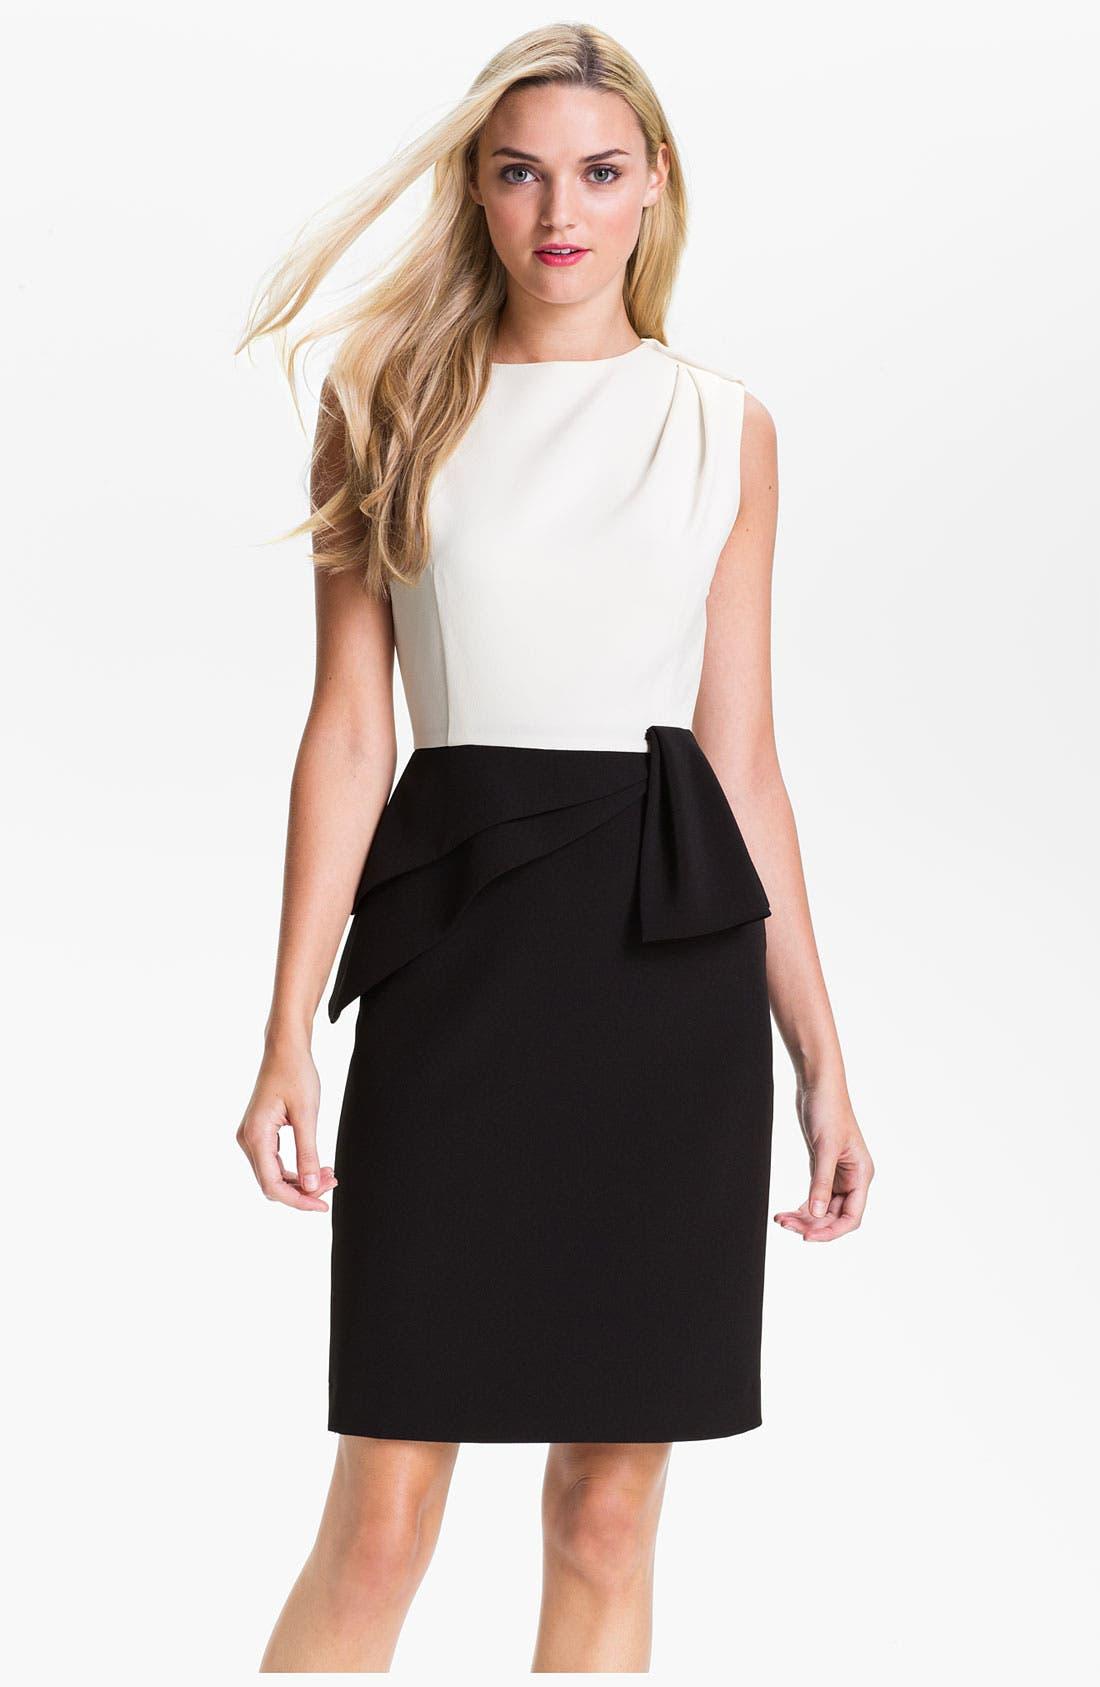 Alternate Image 1 Selected - Adrianna Papell Asymmetrical Peplum Dress (Petite)